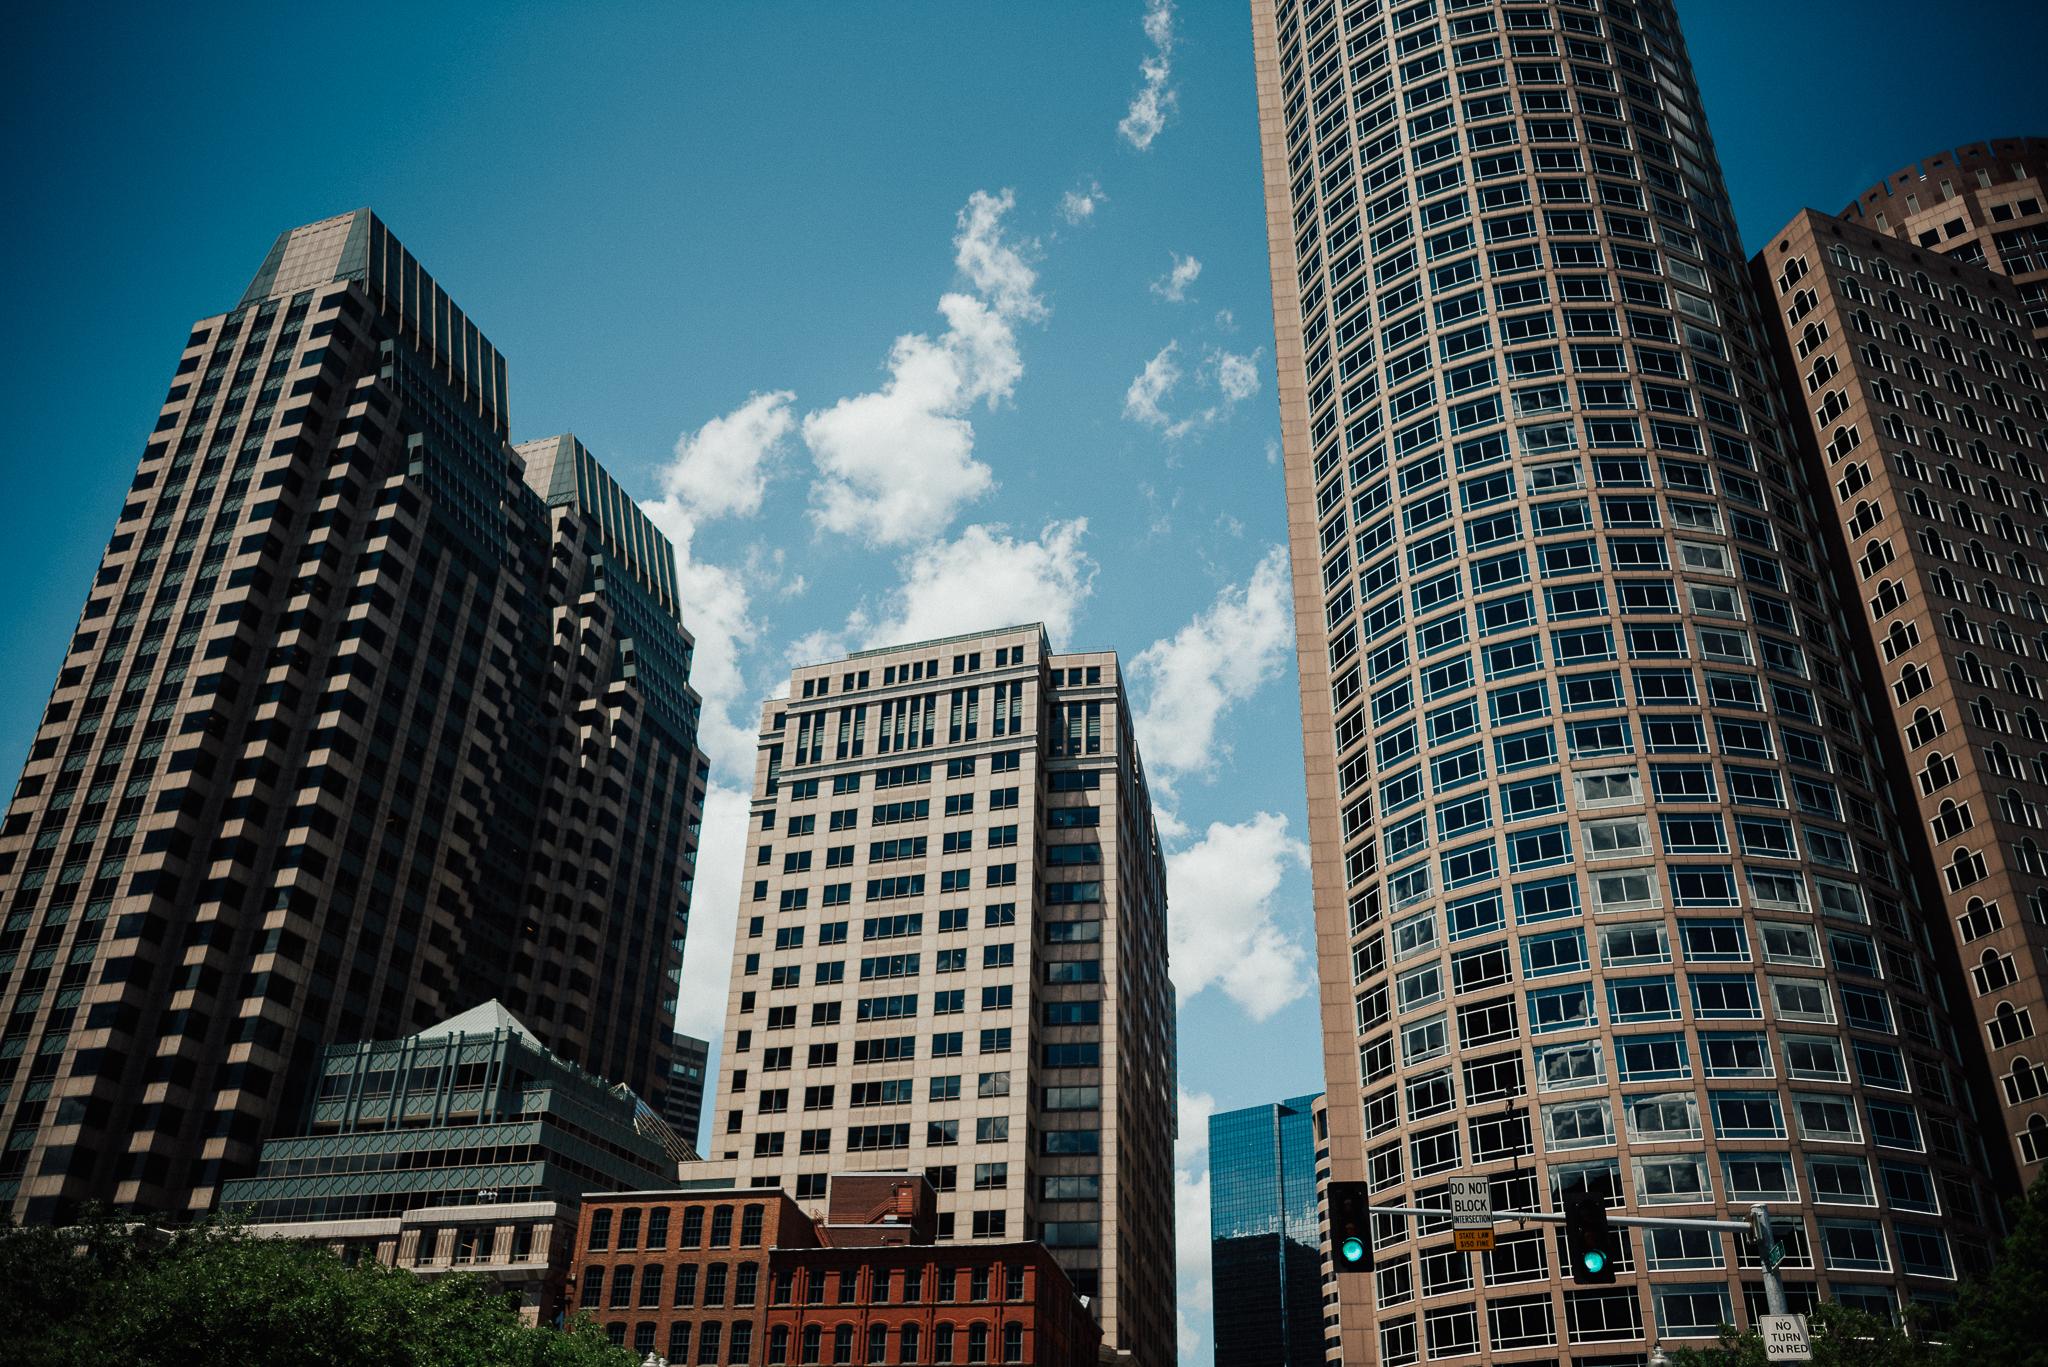 boston_blog-6.jpg